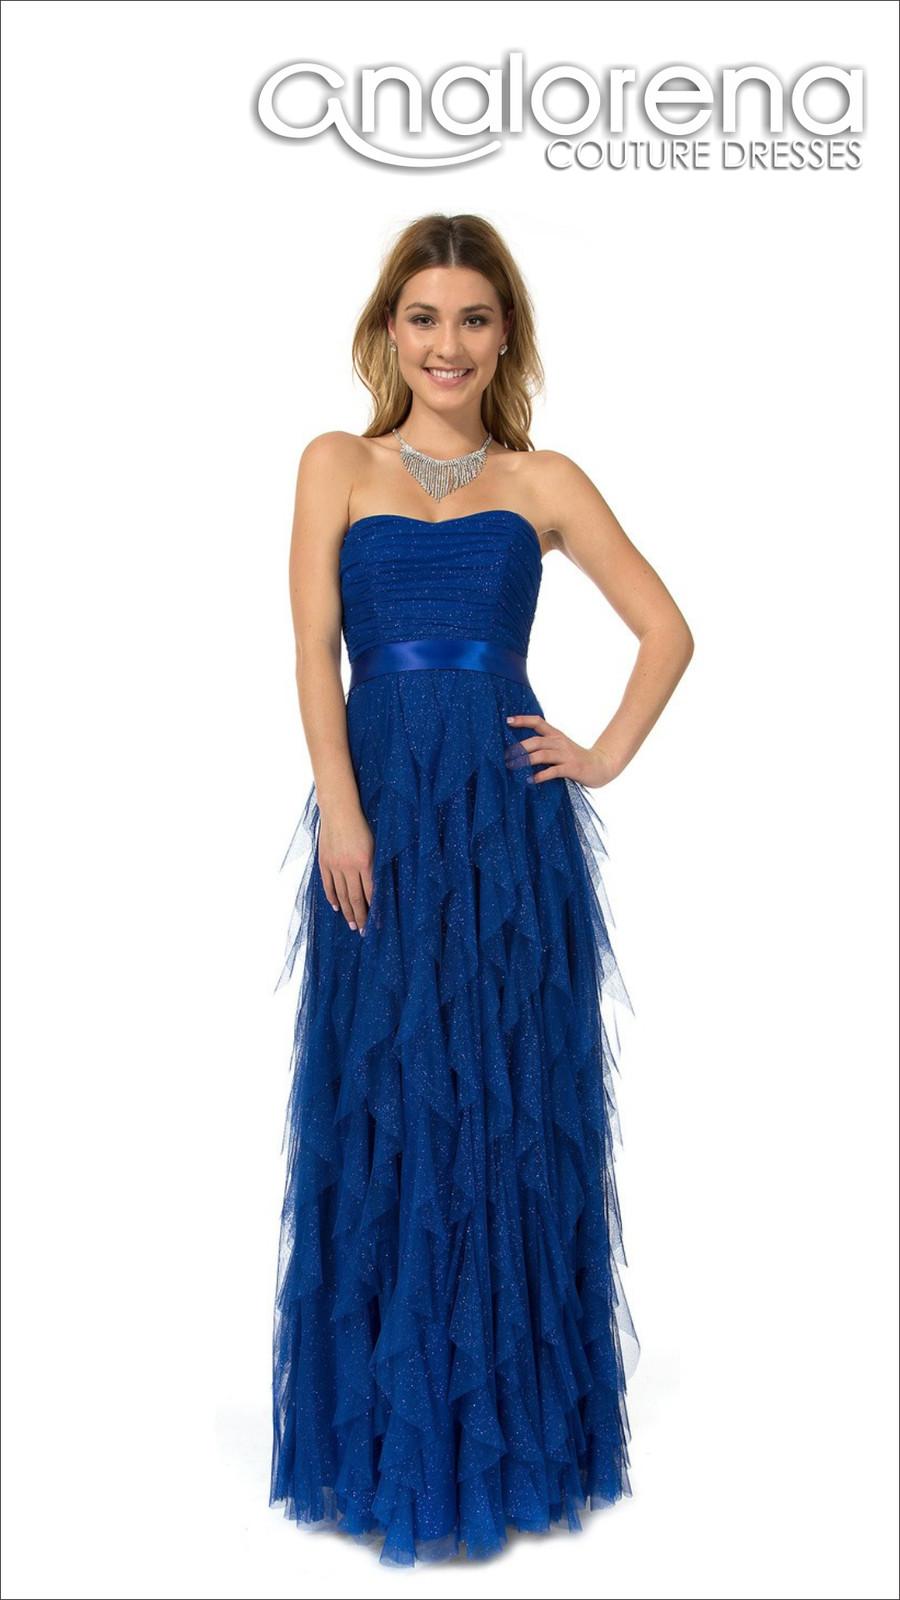 d0e90f025 vestido de fiesta largo petalos rey 2